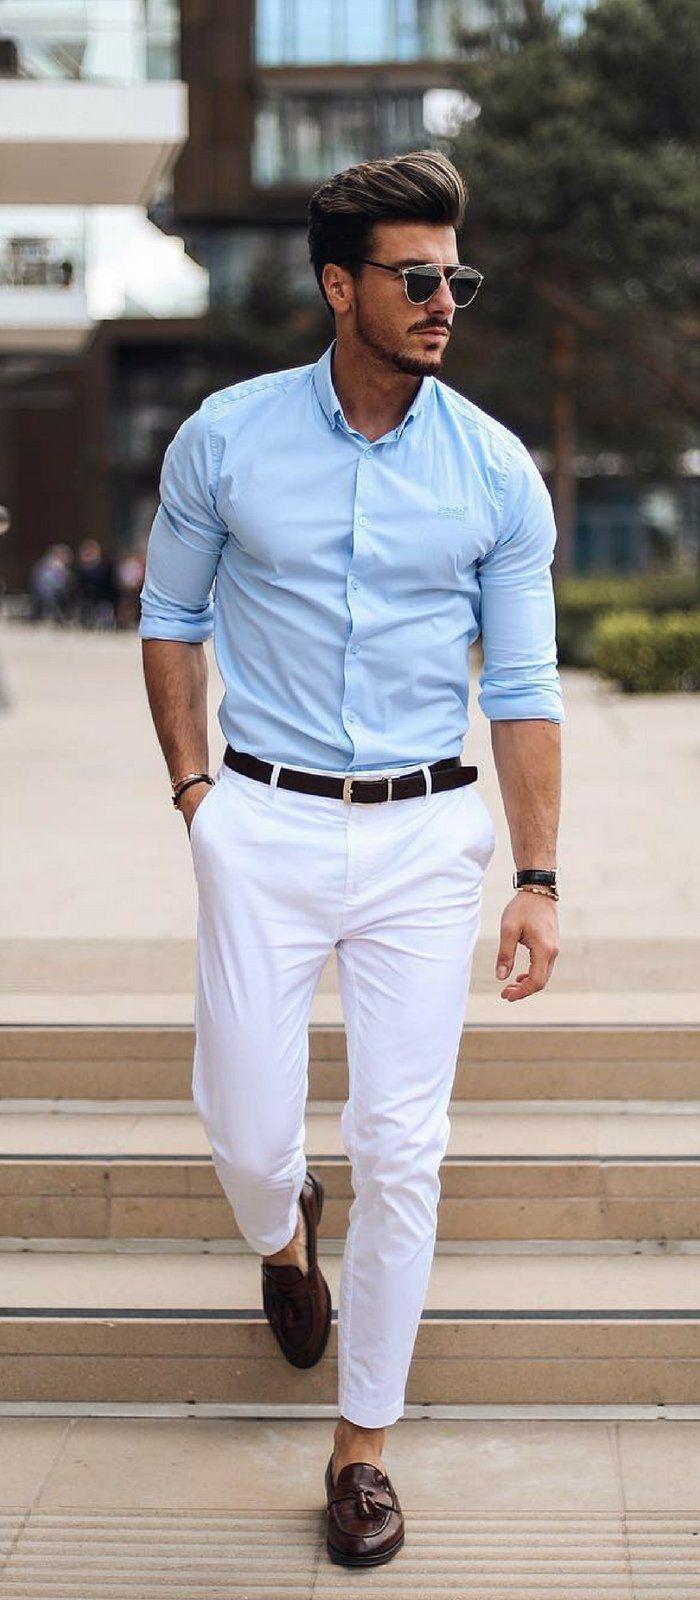 Business casual men Poses in 2019 Business casual men